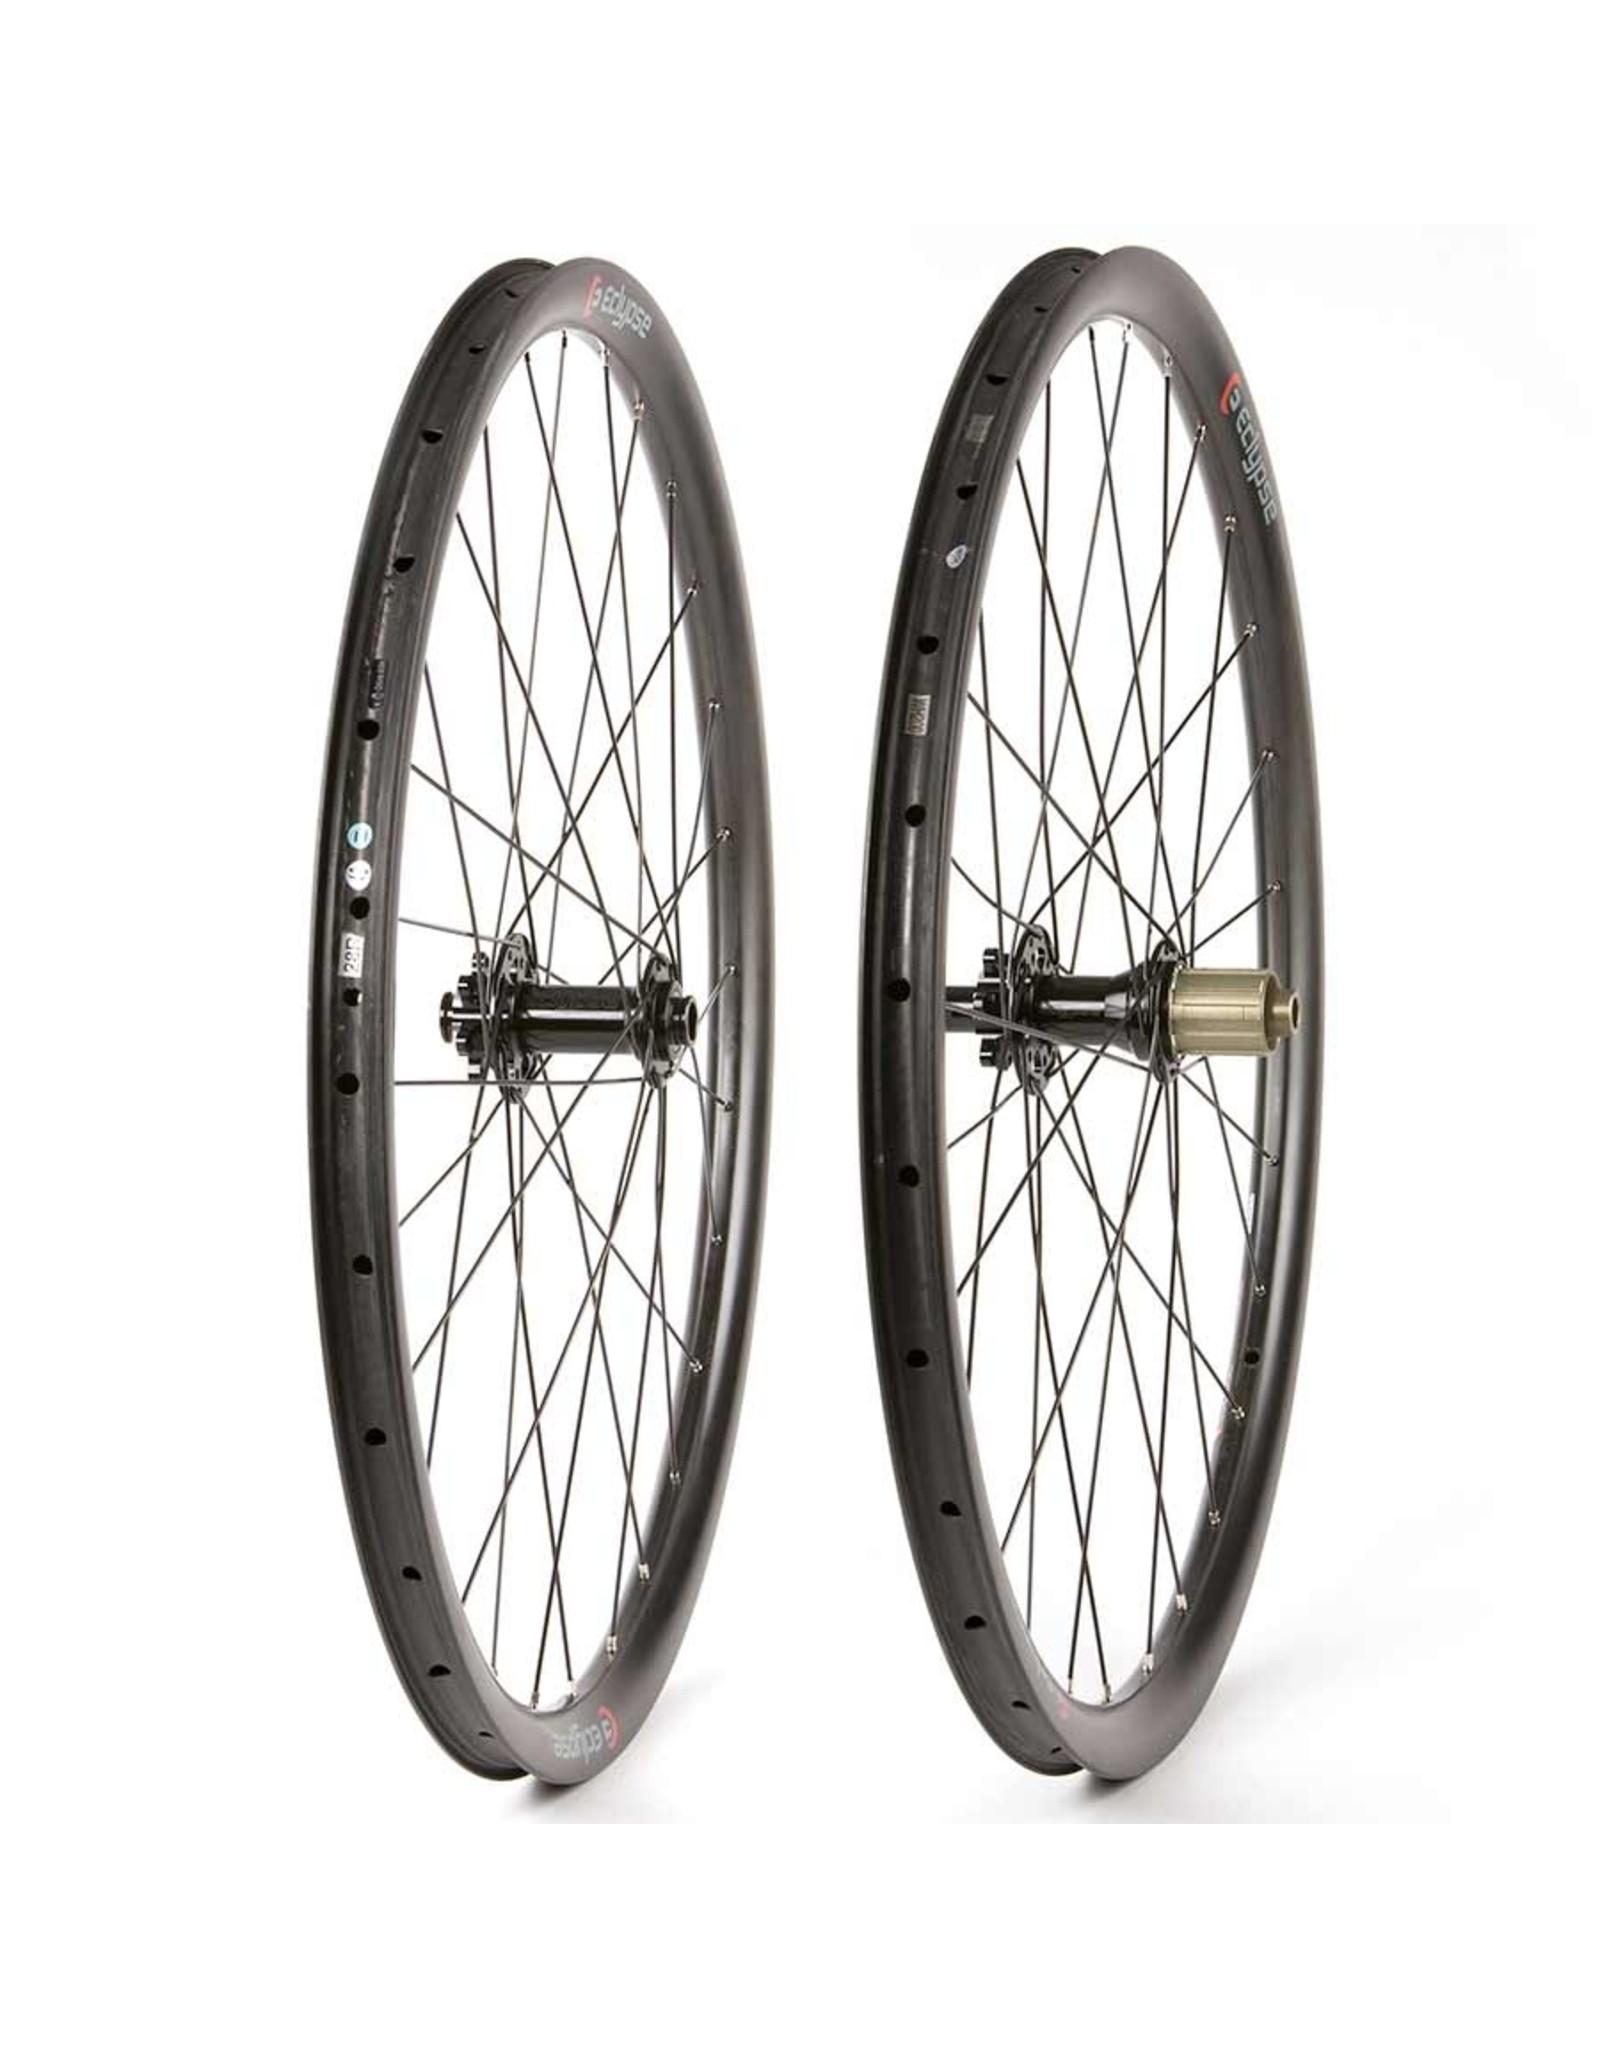 Eclypse, S9 Gravel 650B, Wheel, Front and Rear, 650B / 584, Holes: F: 28, R: 28, 12mm TA, F: 100, R: 142, Disc Center Lock, SRAM XD-R, Pair